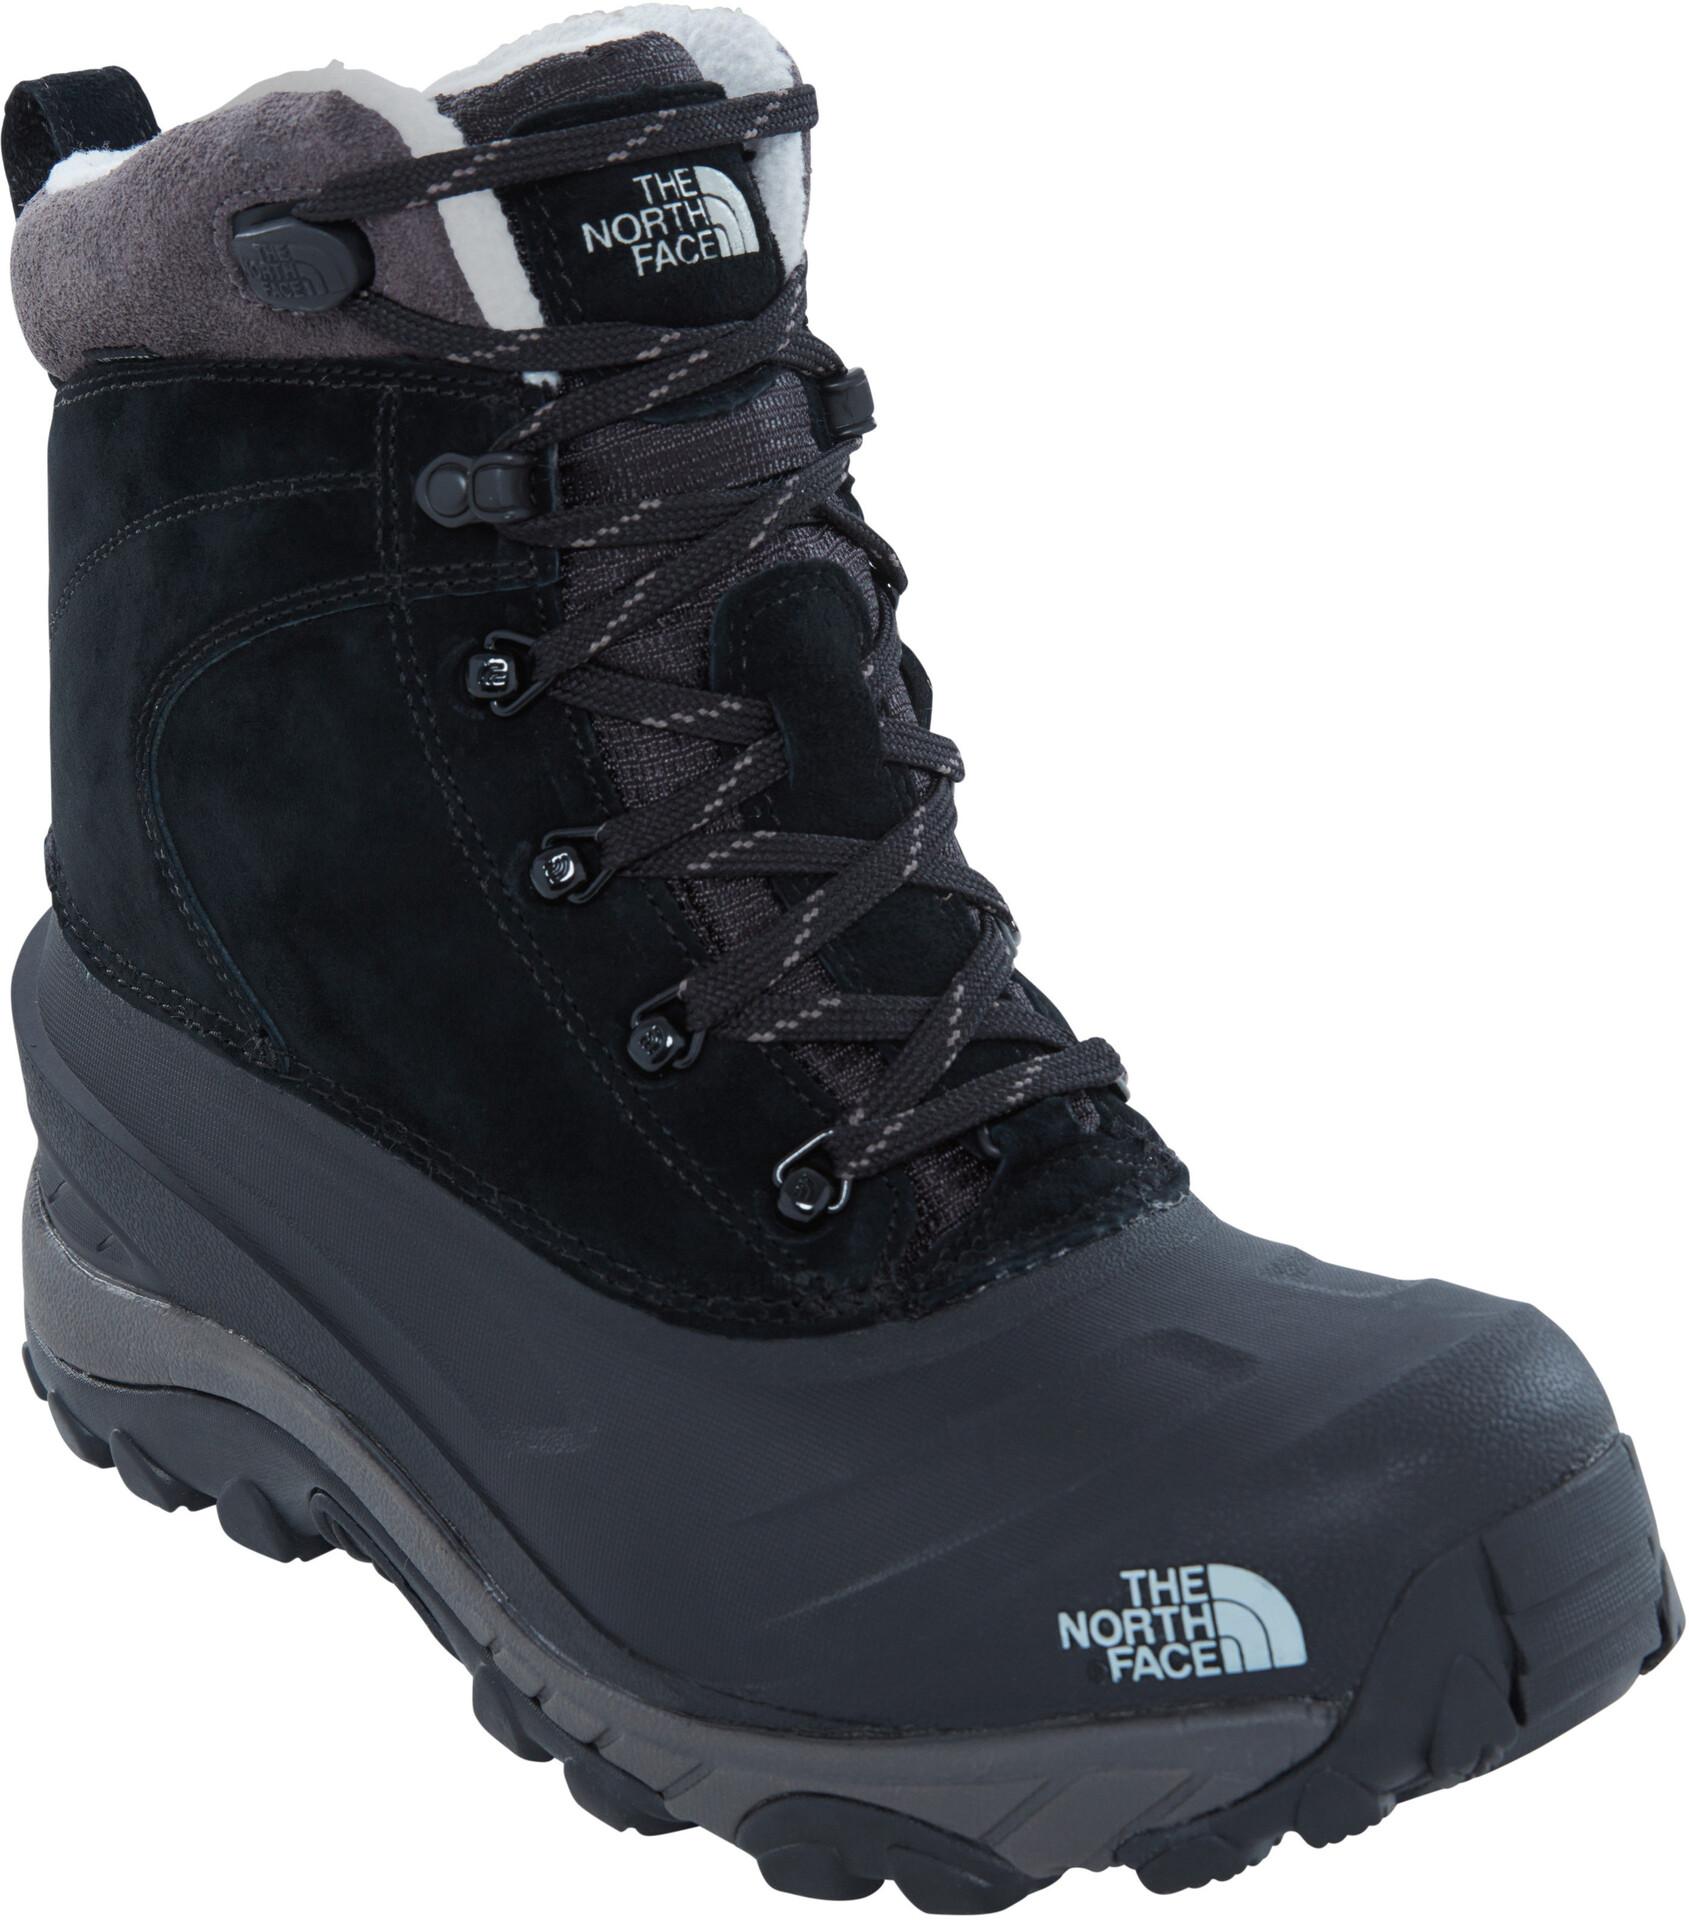 08110ffc113fb The north face chilkat iii boots men black dark gull grey jpg 2808x3192  Botas para nieve